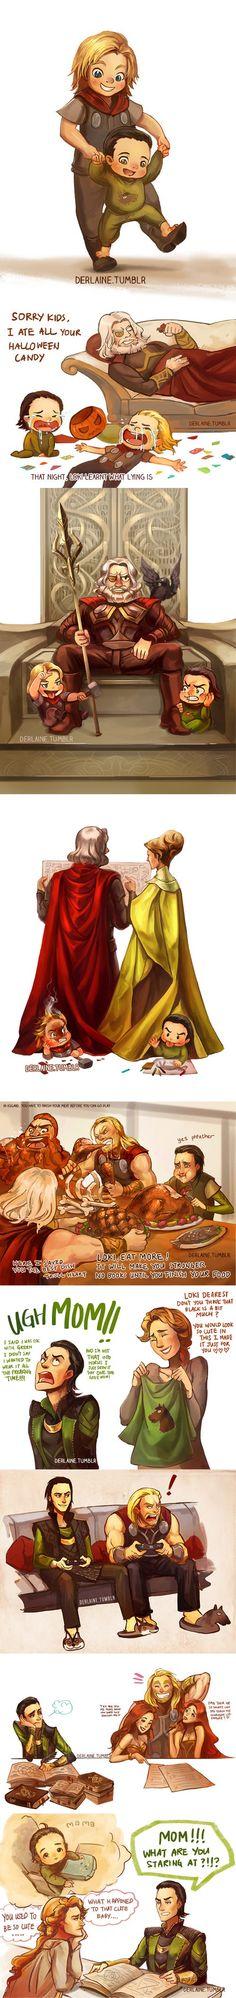 Thor and Loki's childhood    Thor Odinson, Loki Laufeyson, Odin, Frigga    500px × 4,234px    #fanart